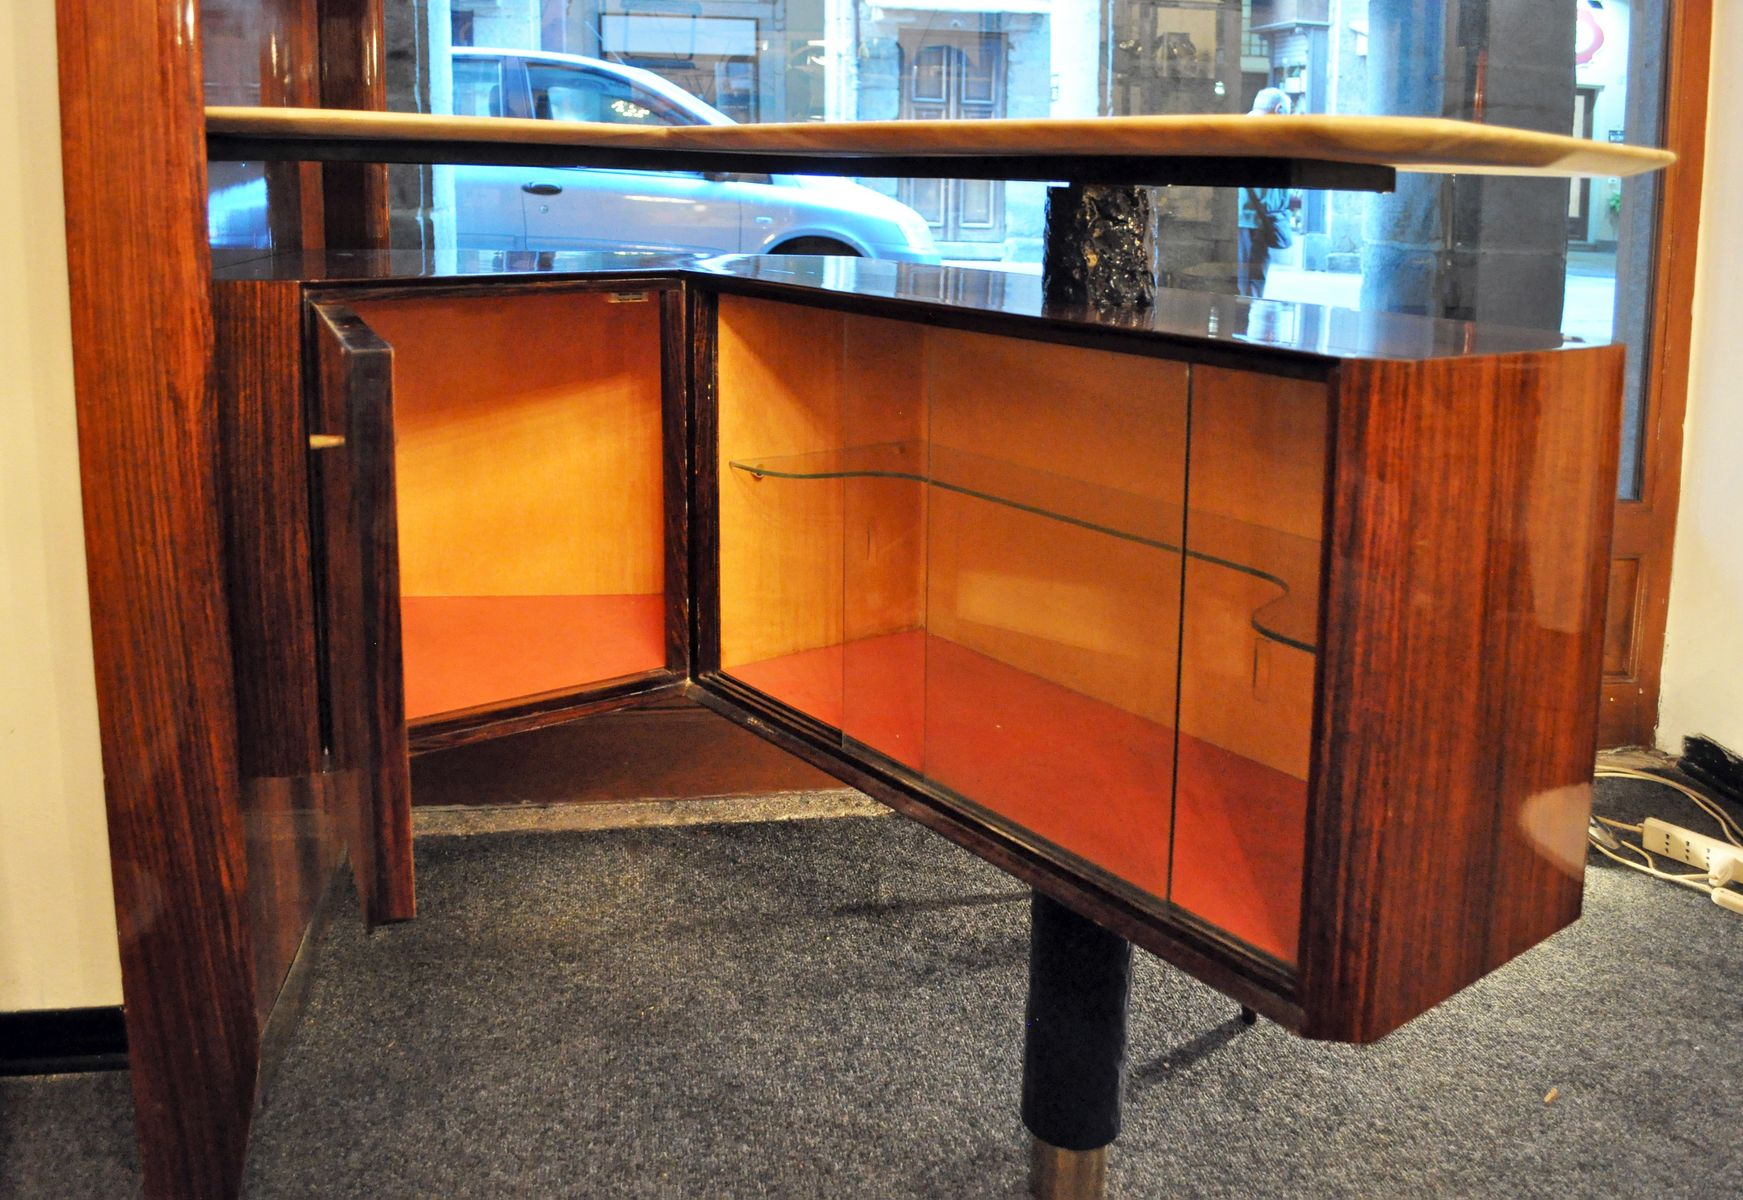 Vintage italian mobile bar by osvaldo borsani for borsani - Mobile bar vintage ...